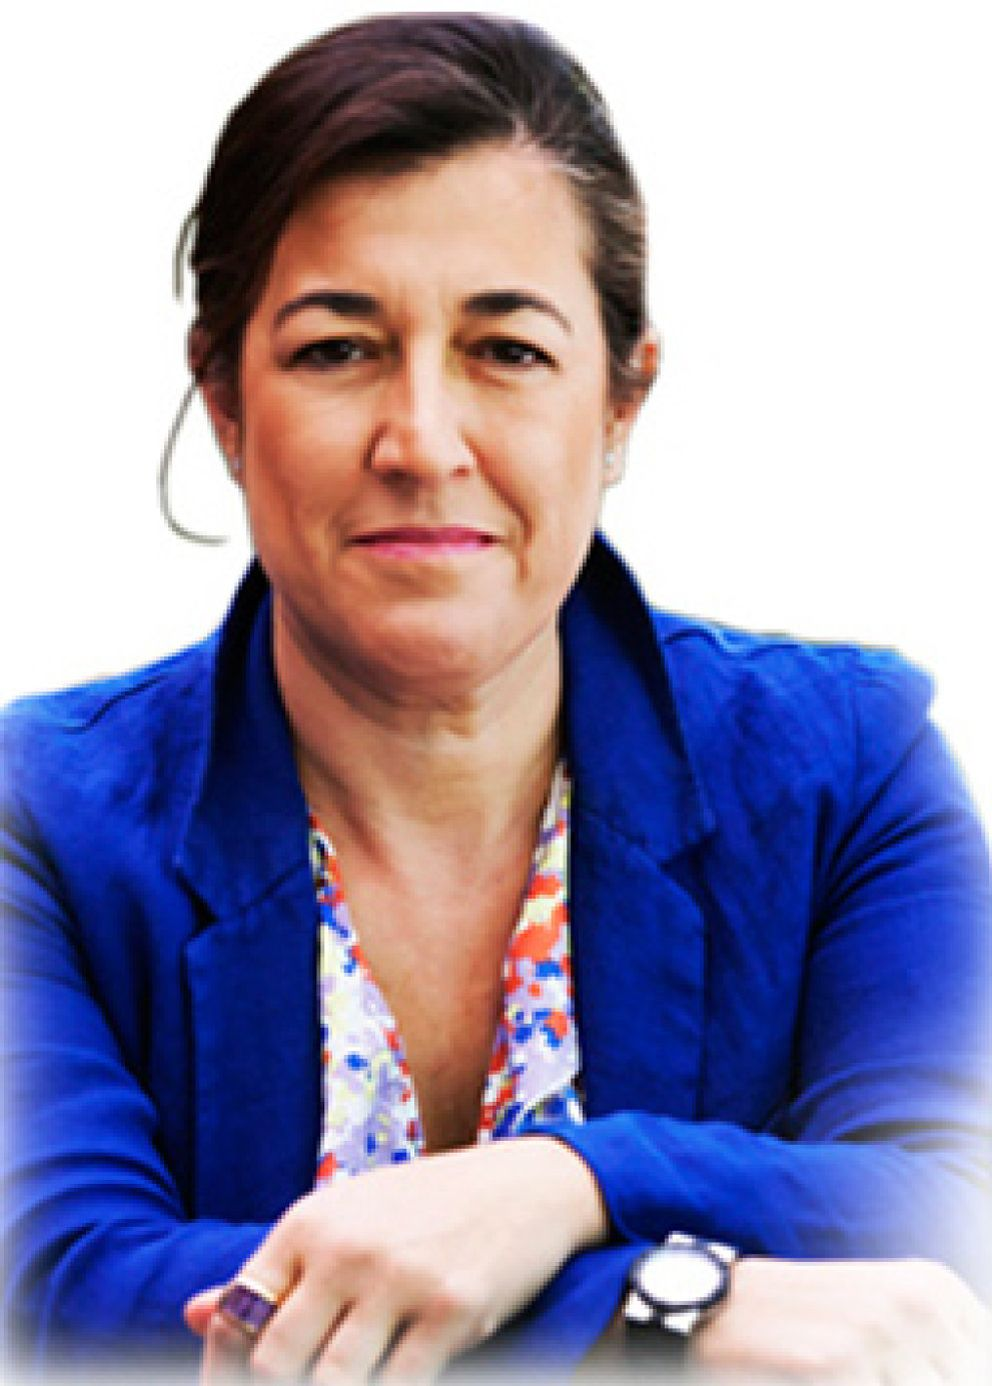 Noticias de Abertis: Elena Pisonero será la nueva presidenta de ...